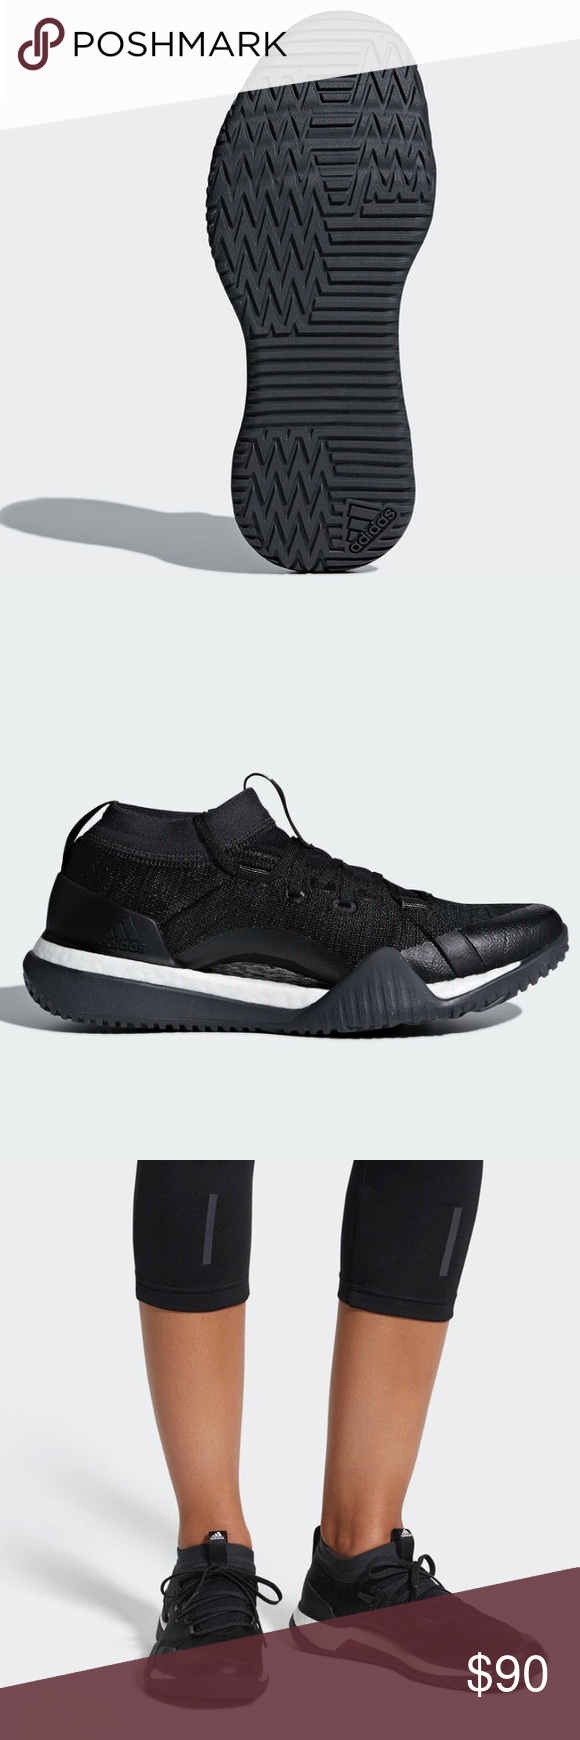 adidas training shoes women